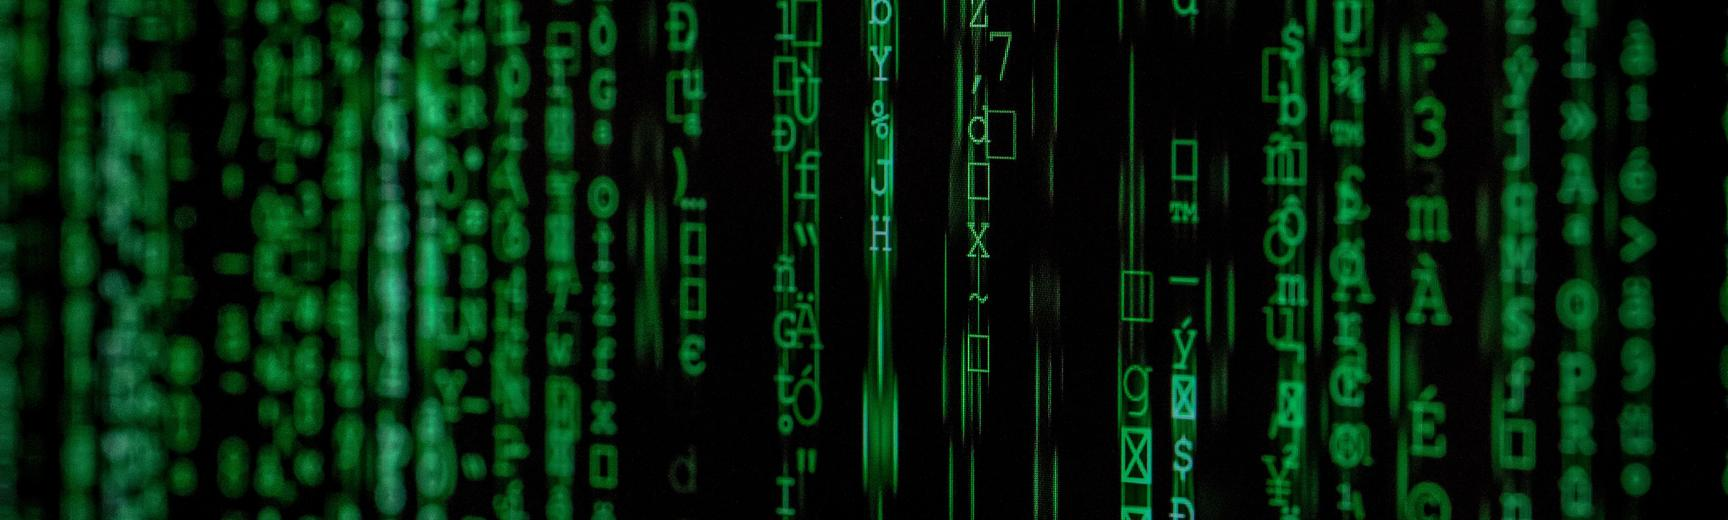 Hacker binary attack code